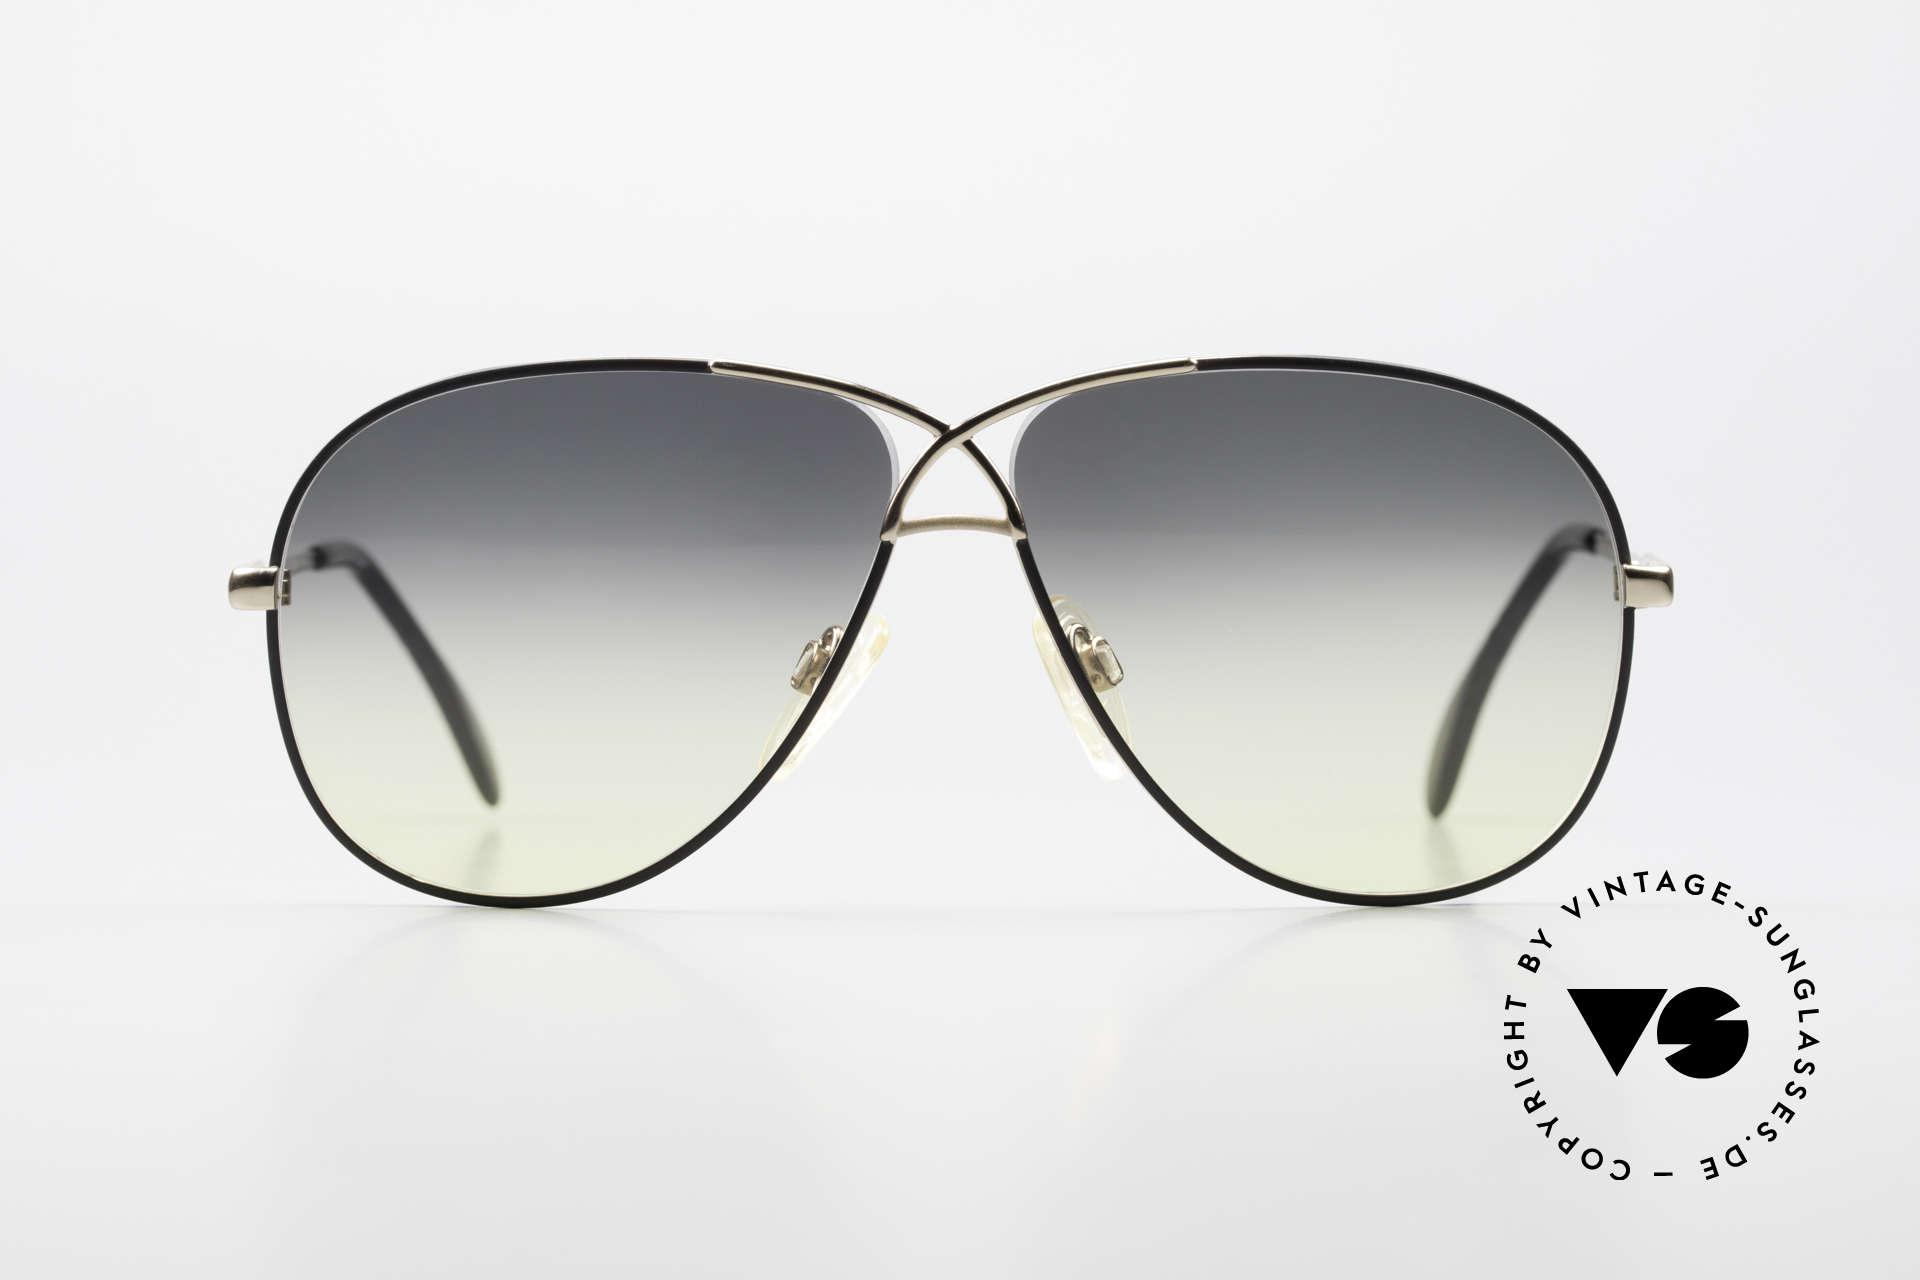 Cazal 728 Designer Aviator Sunglasses, CAZAL's response to the Ray-Ban 'Large Metal', Made for Men and Women